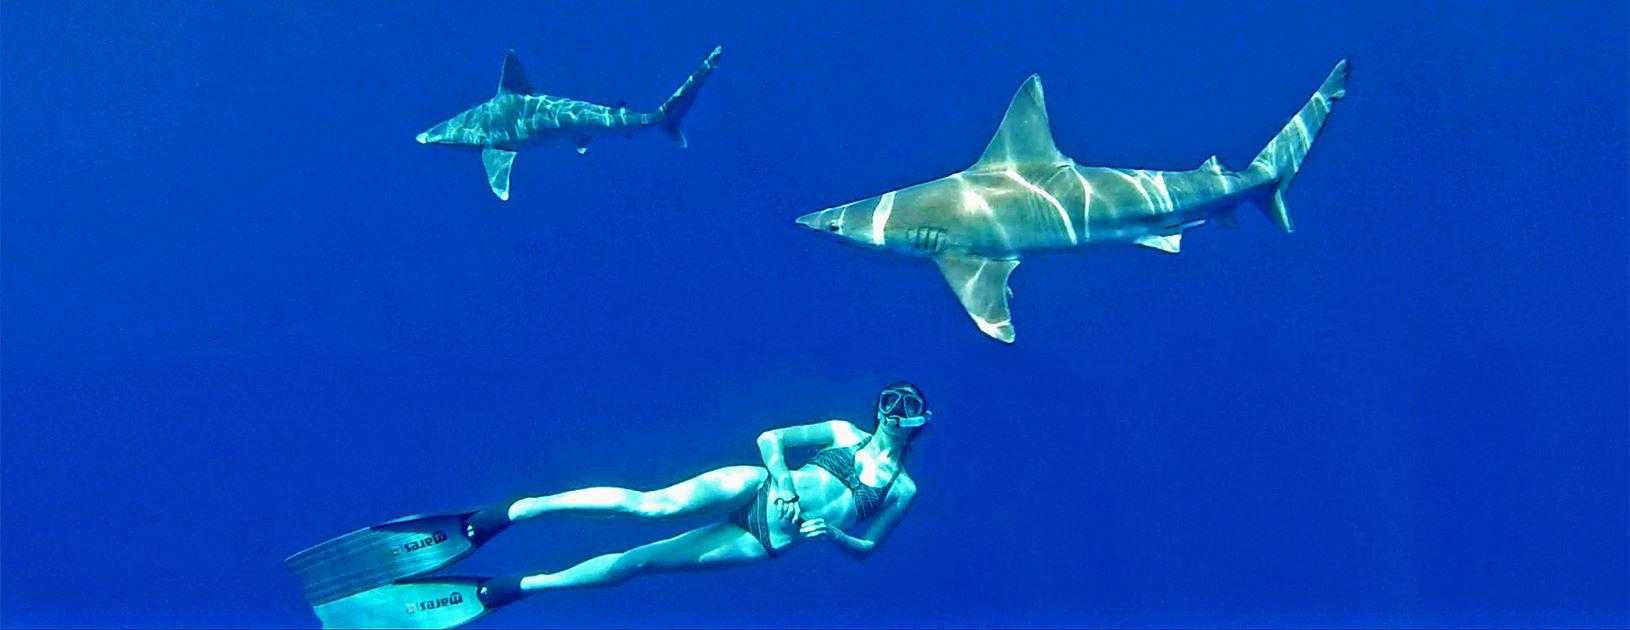 Laura Corbe swimming with sharks, Hawaii. Photo Juan Oliphant